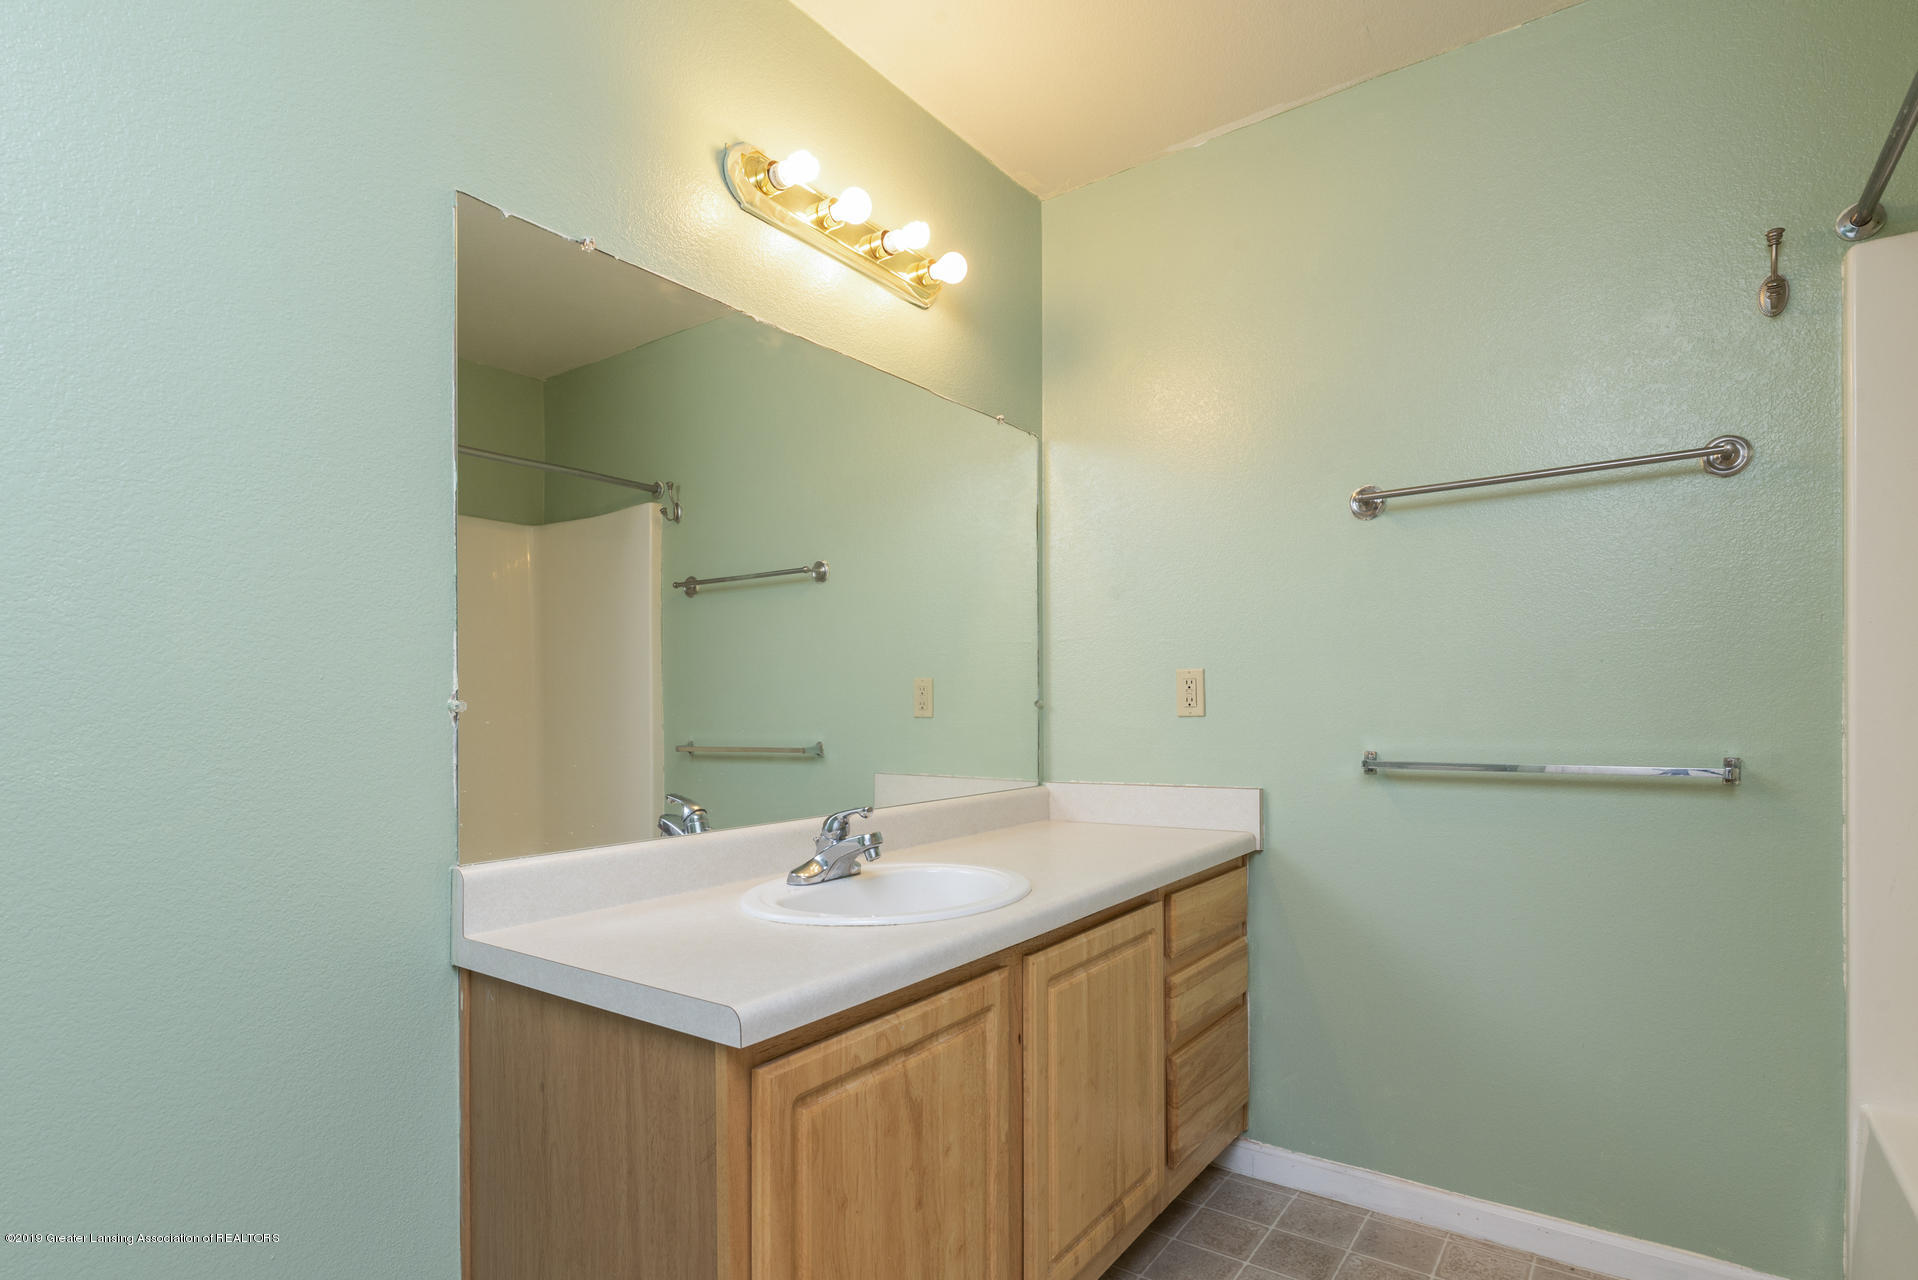 338 W Saginaw St UNIT 44 - 016-photo-bathroom-7483702 - 17